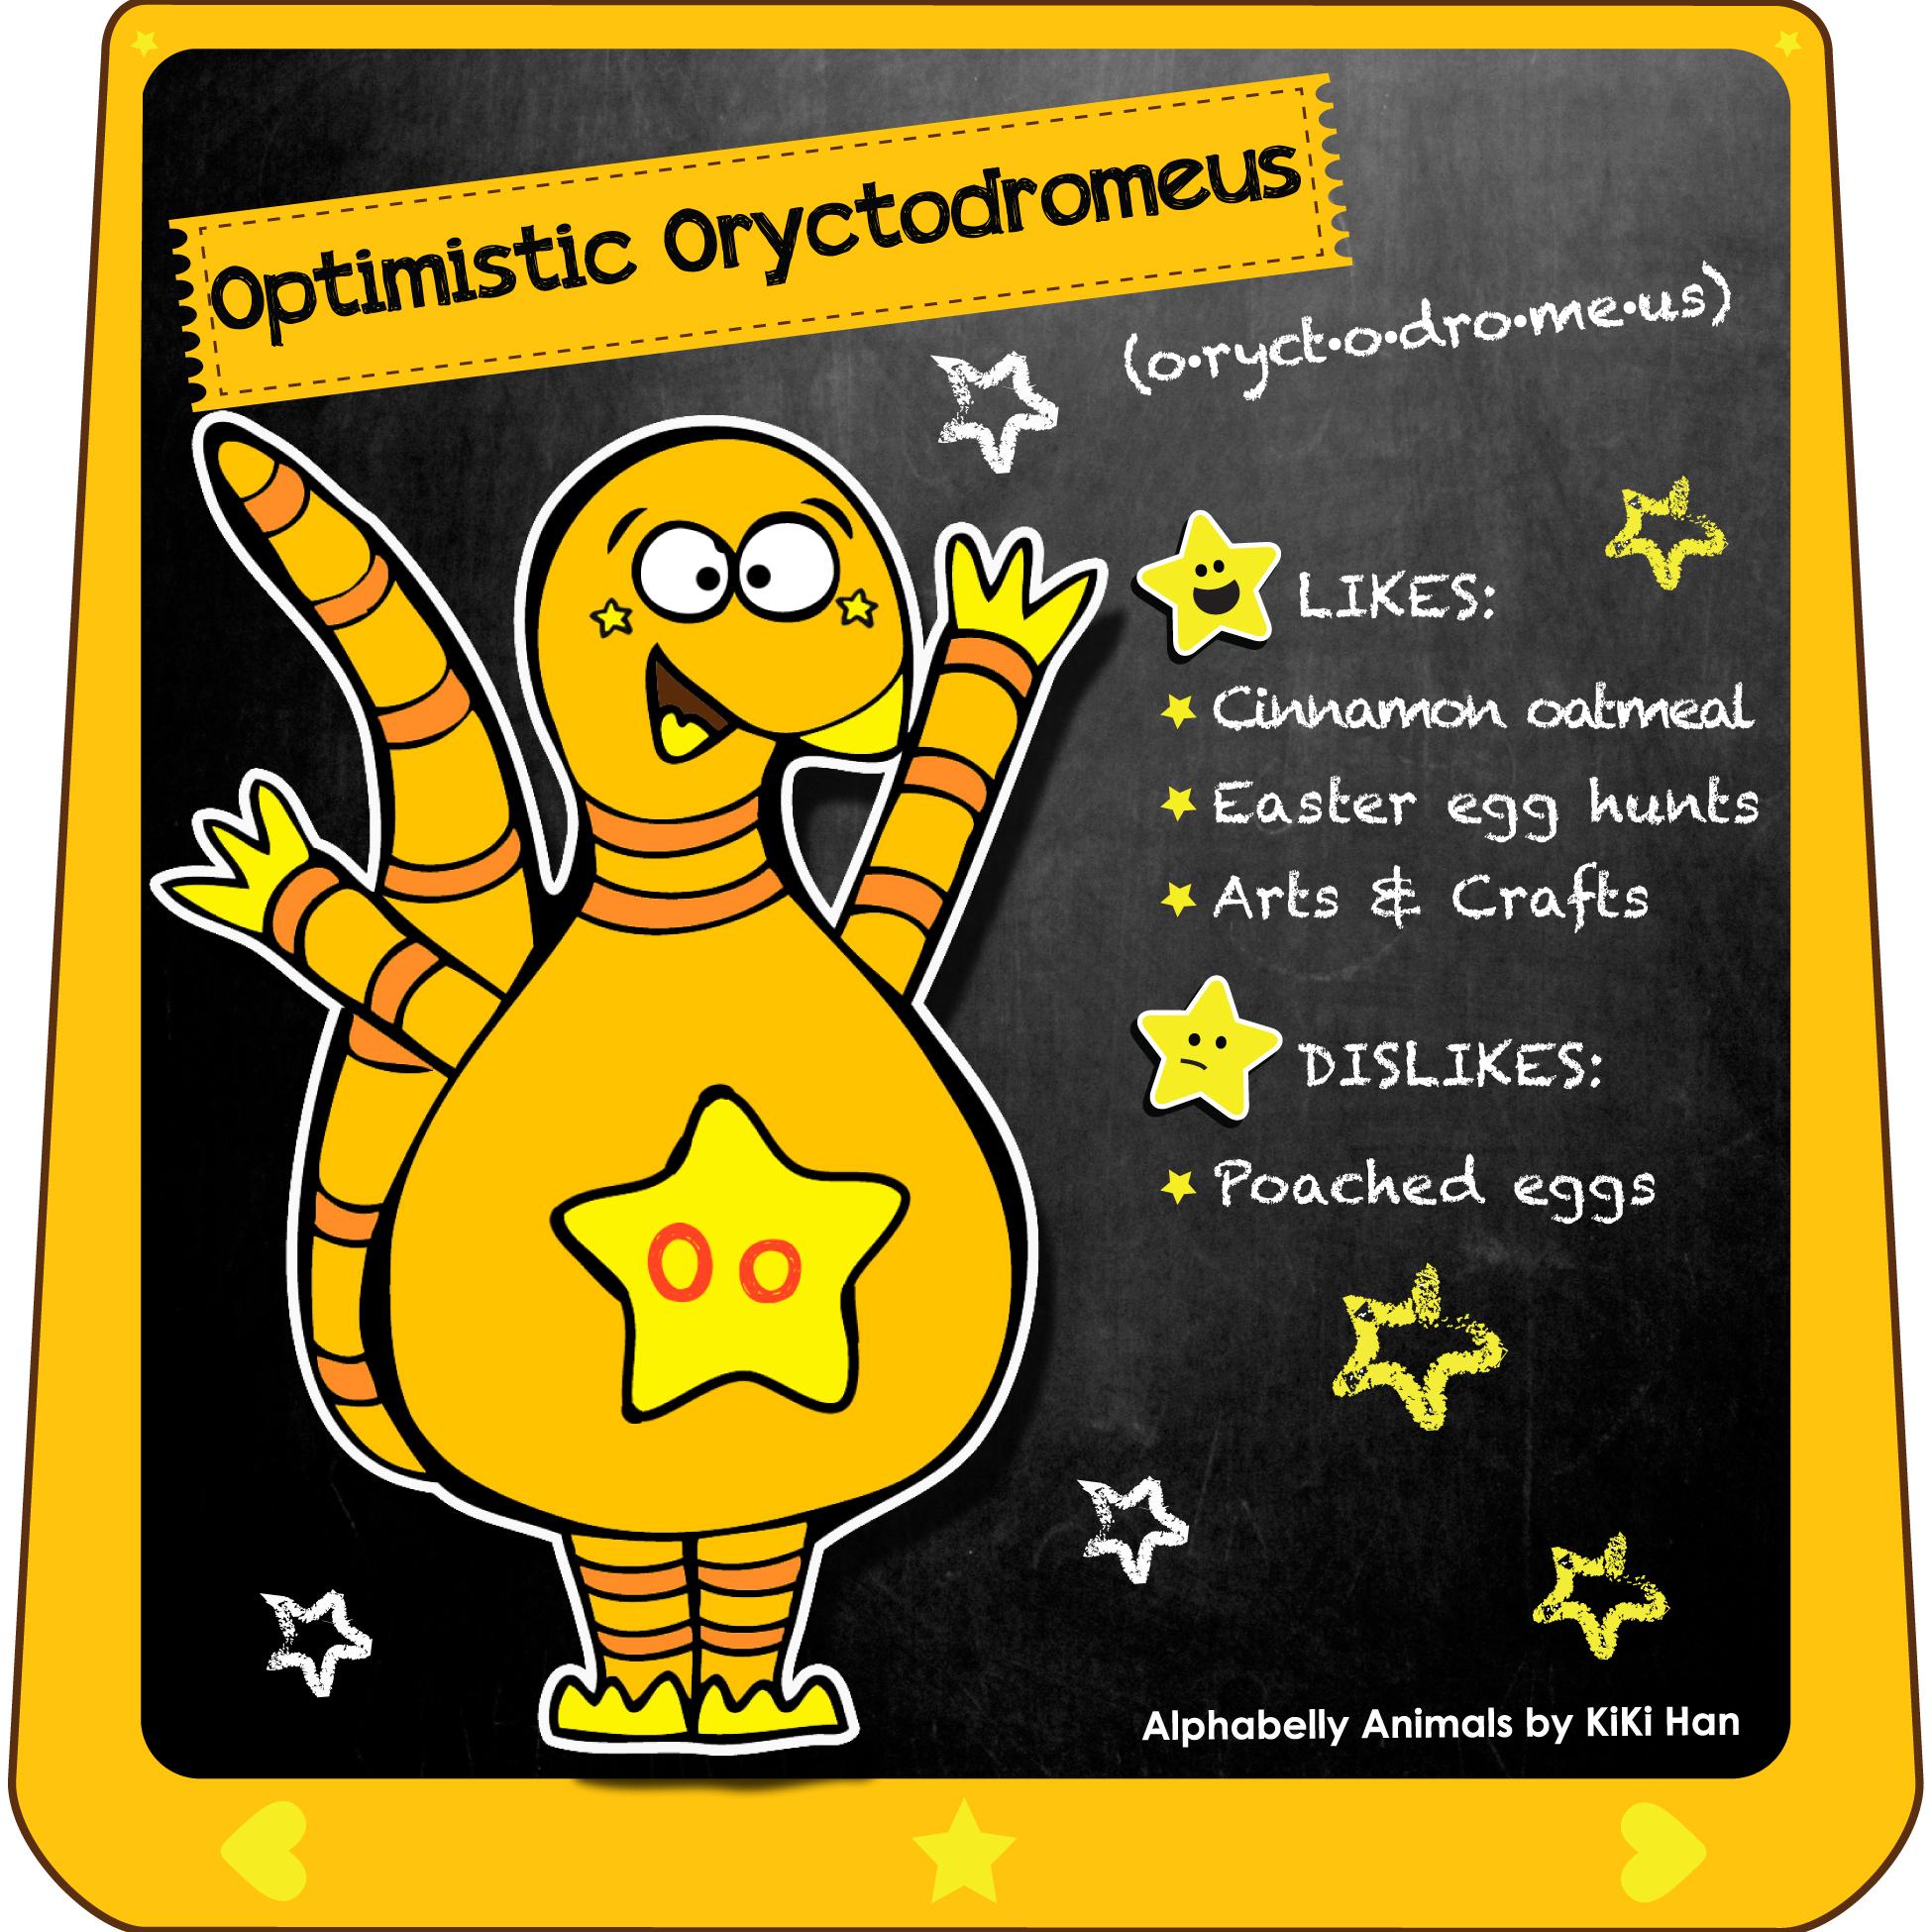 Oryctodromeus I KiKi Han I KiKiHan I GeekyKiKi I Geeky KiKi I Missgeekykiki I Cutiecons I Cutiecon I Cutie Con I Alphabellies I Alphabelly I A to Z Animal Poster